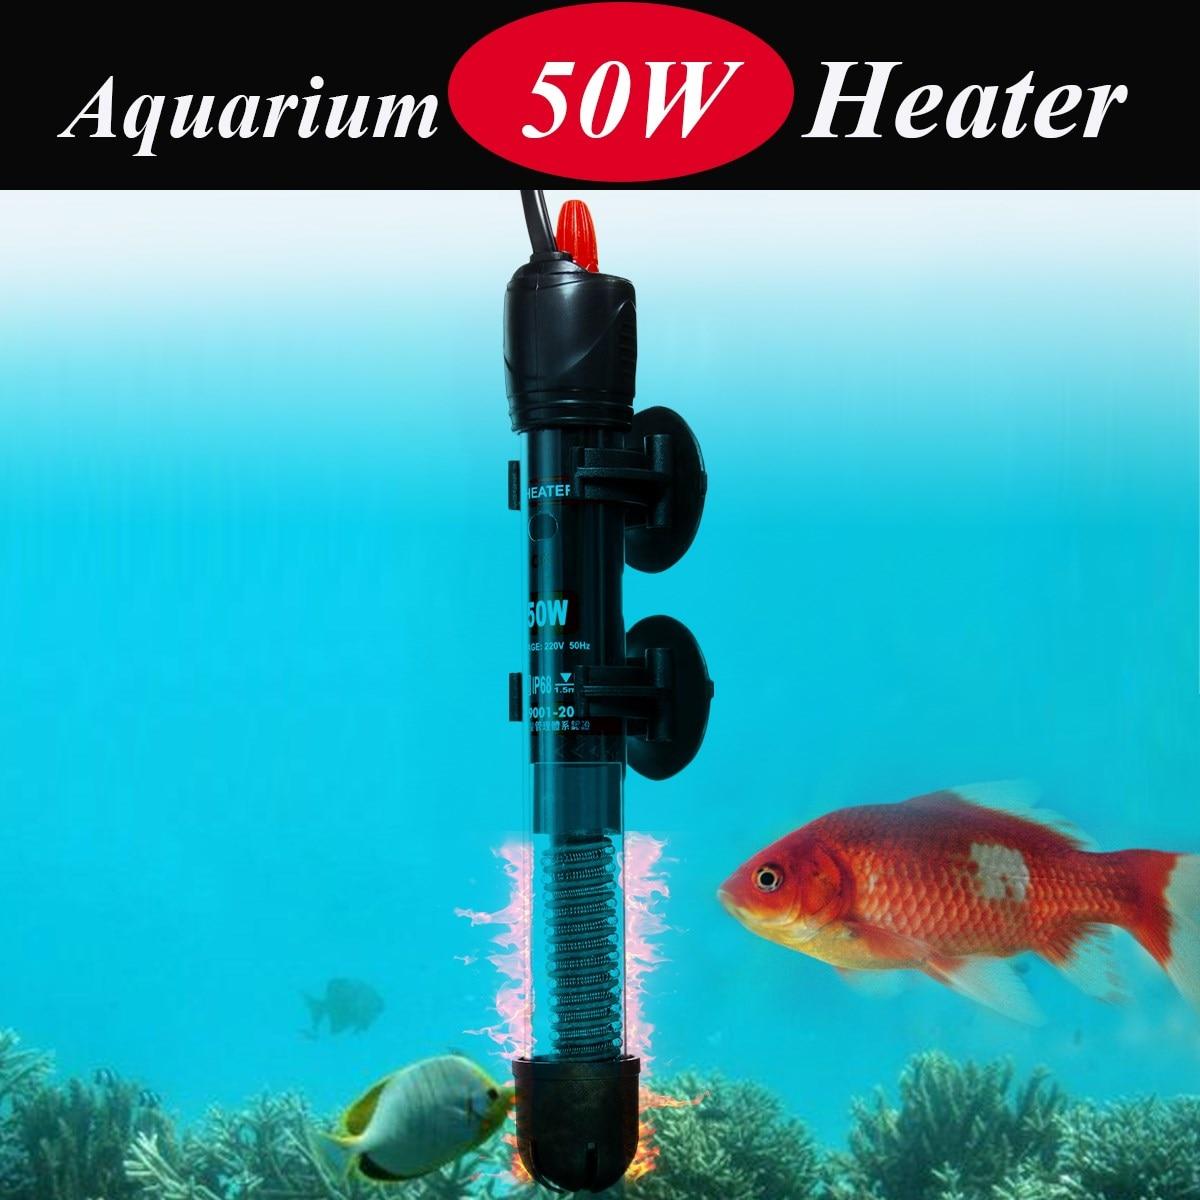 50W/100W/200W/300W Submersible Aquarium Fish Tank Water Heater Automatic Adjustable Temperature Heating Device Heater Tank tank water heater water heater heat water tank - title=